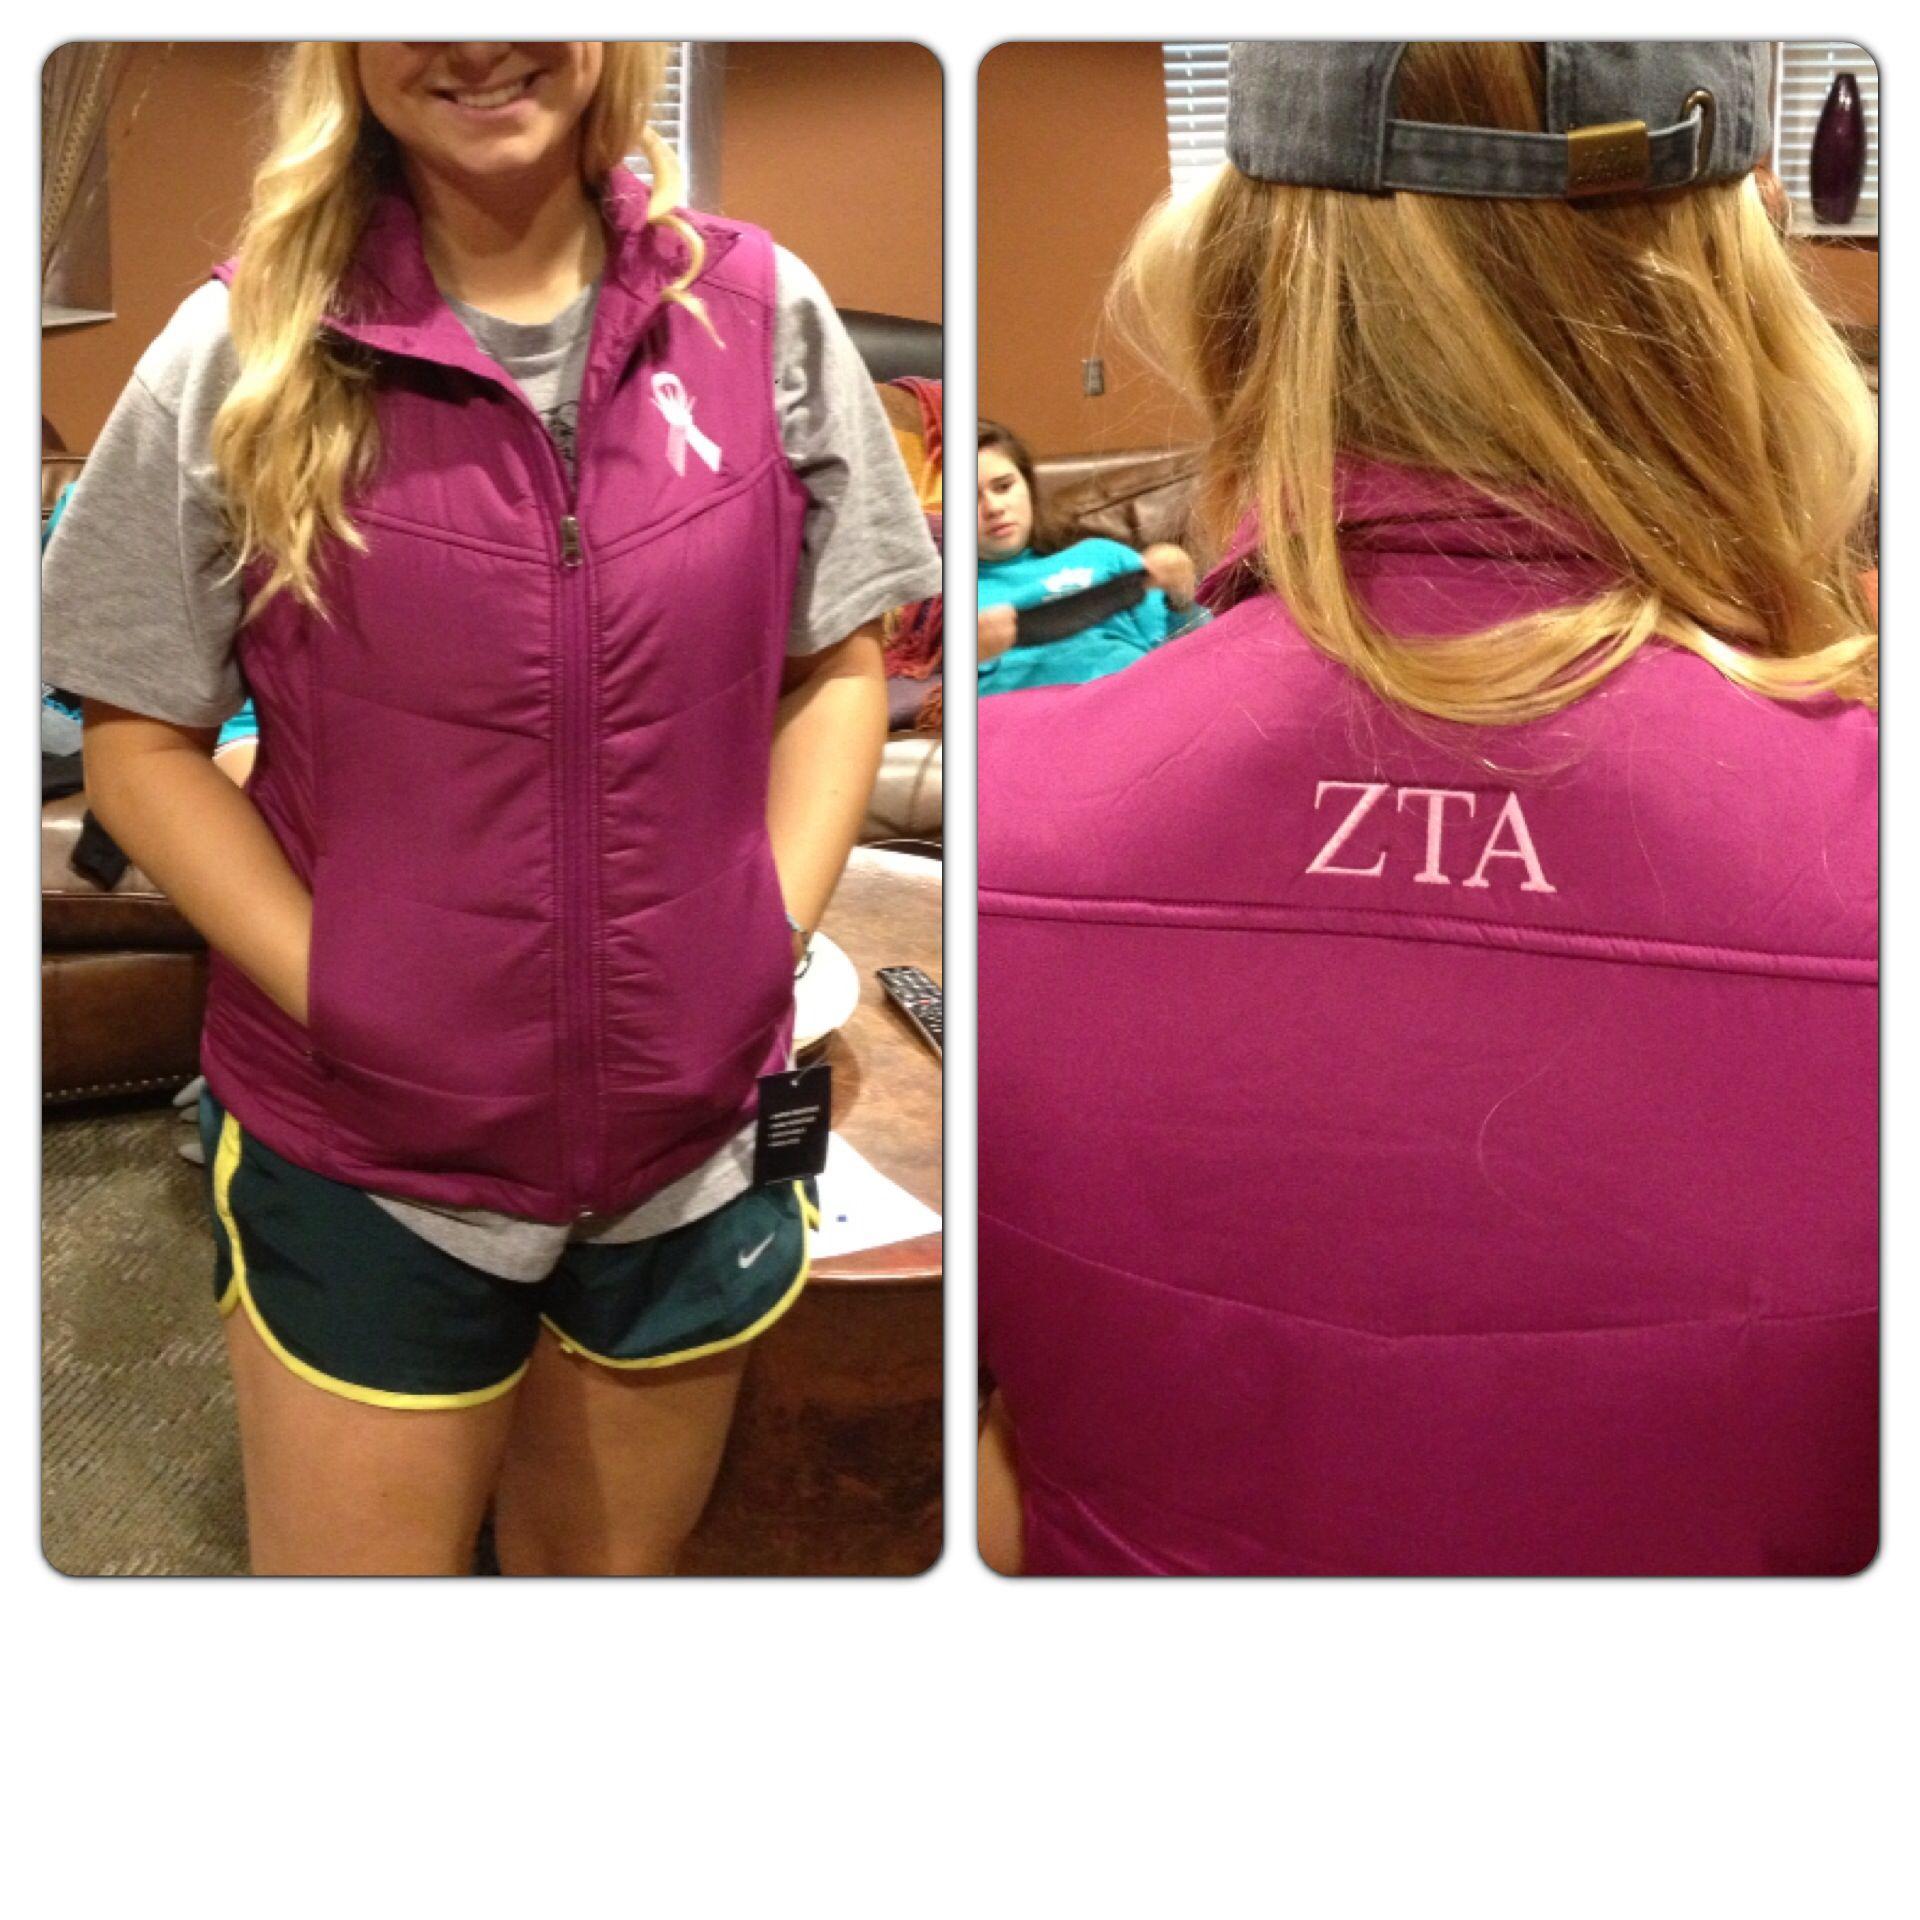 Zeta At Kansas State Think Pink Vests I Designed New Zta Crown And All Sorority Outfits Pink Vest Zta